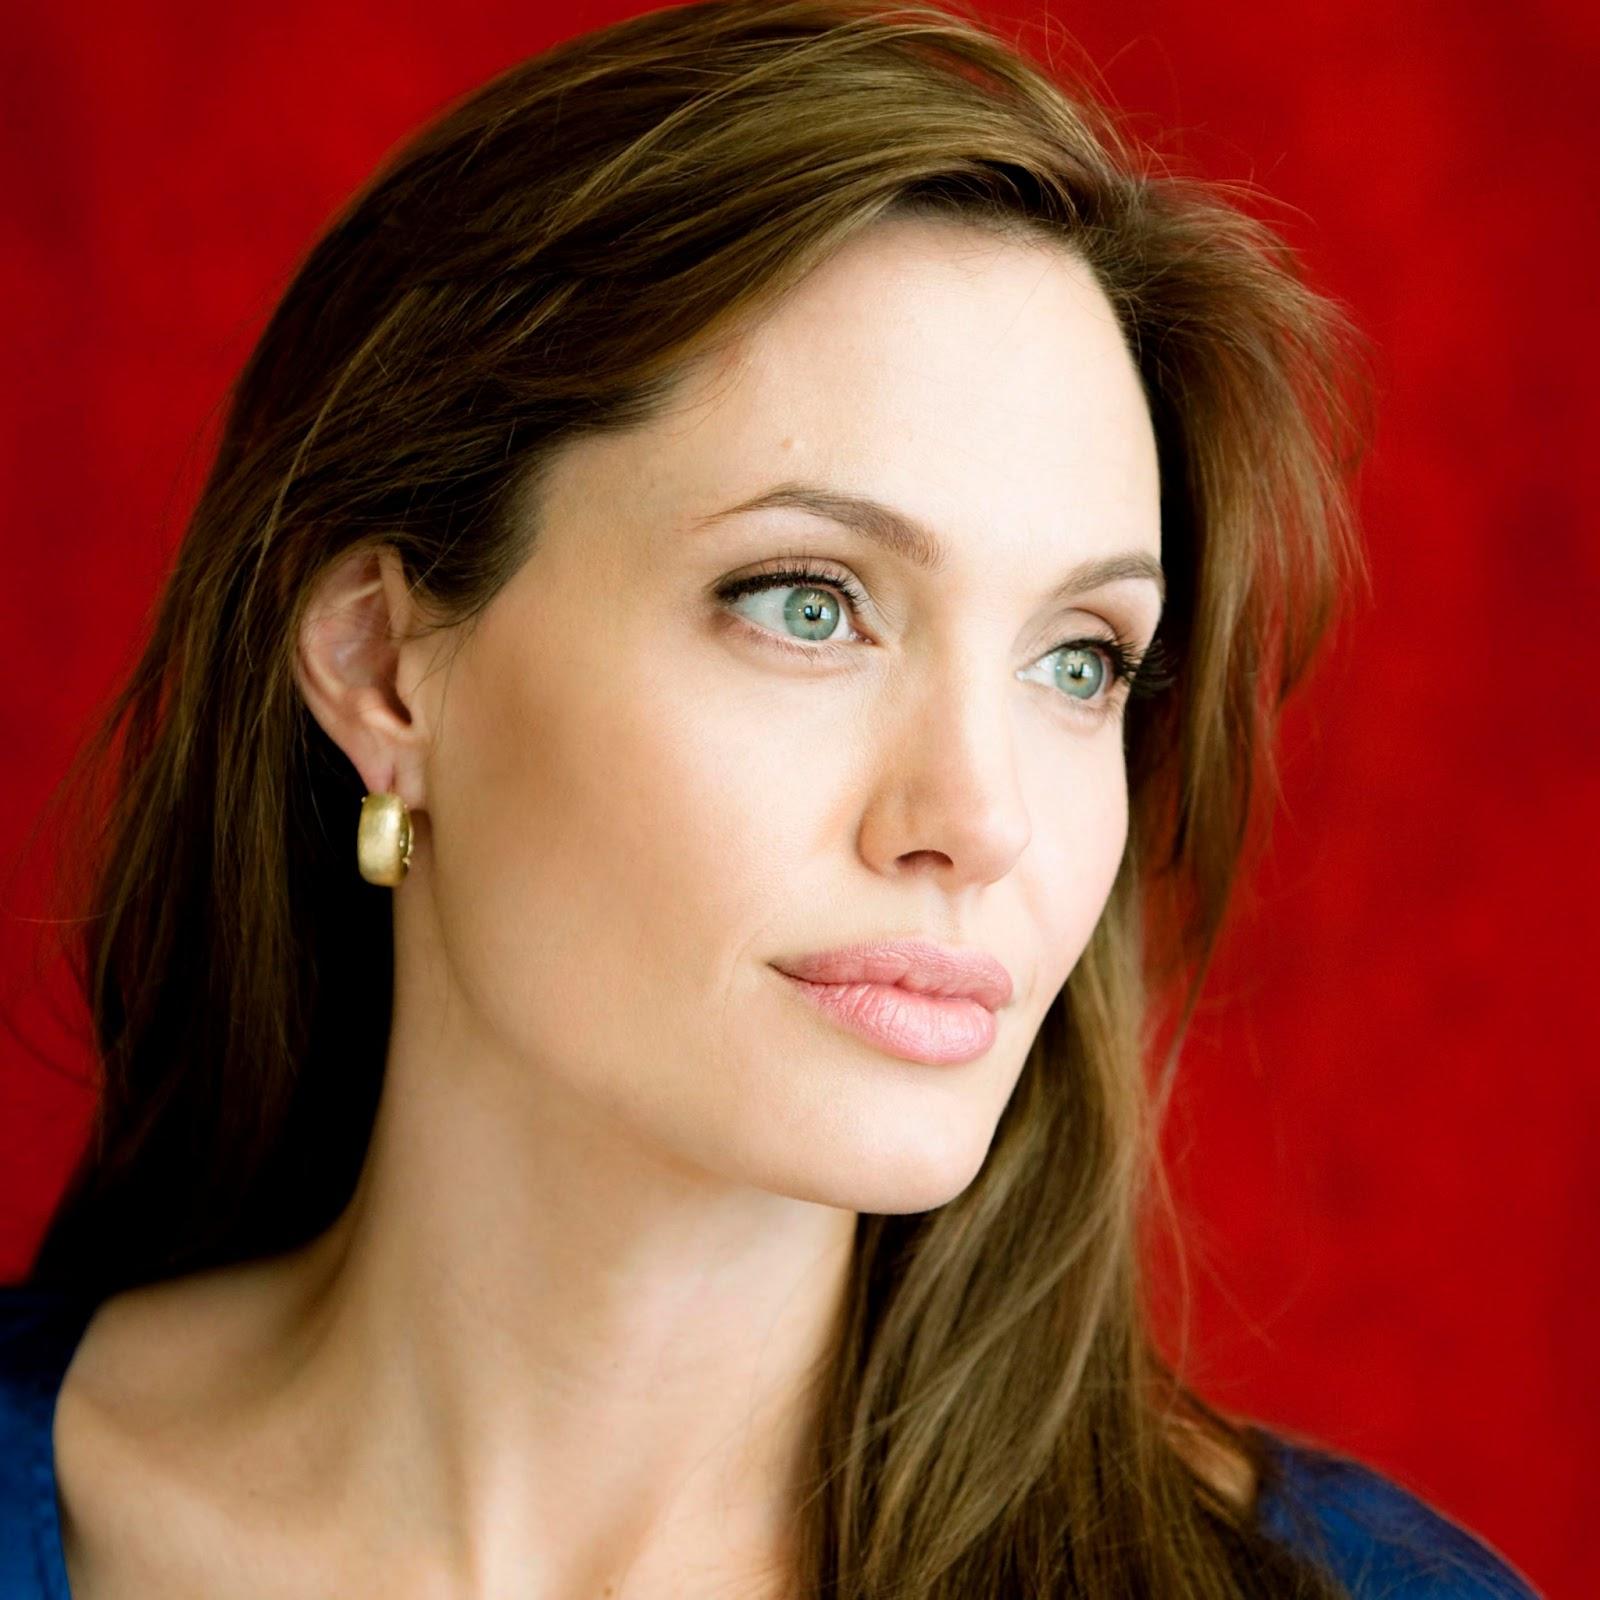 http://2.bp.blogspot.com/-2g33Udx1XkM/UWGiqkexnDI/AAAAAAAACls/7hSaekyPOa0/s1600/Angelina+Jolie+latest+new+fresh+(1).jpg